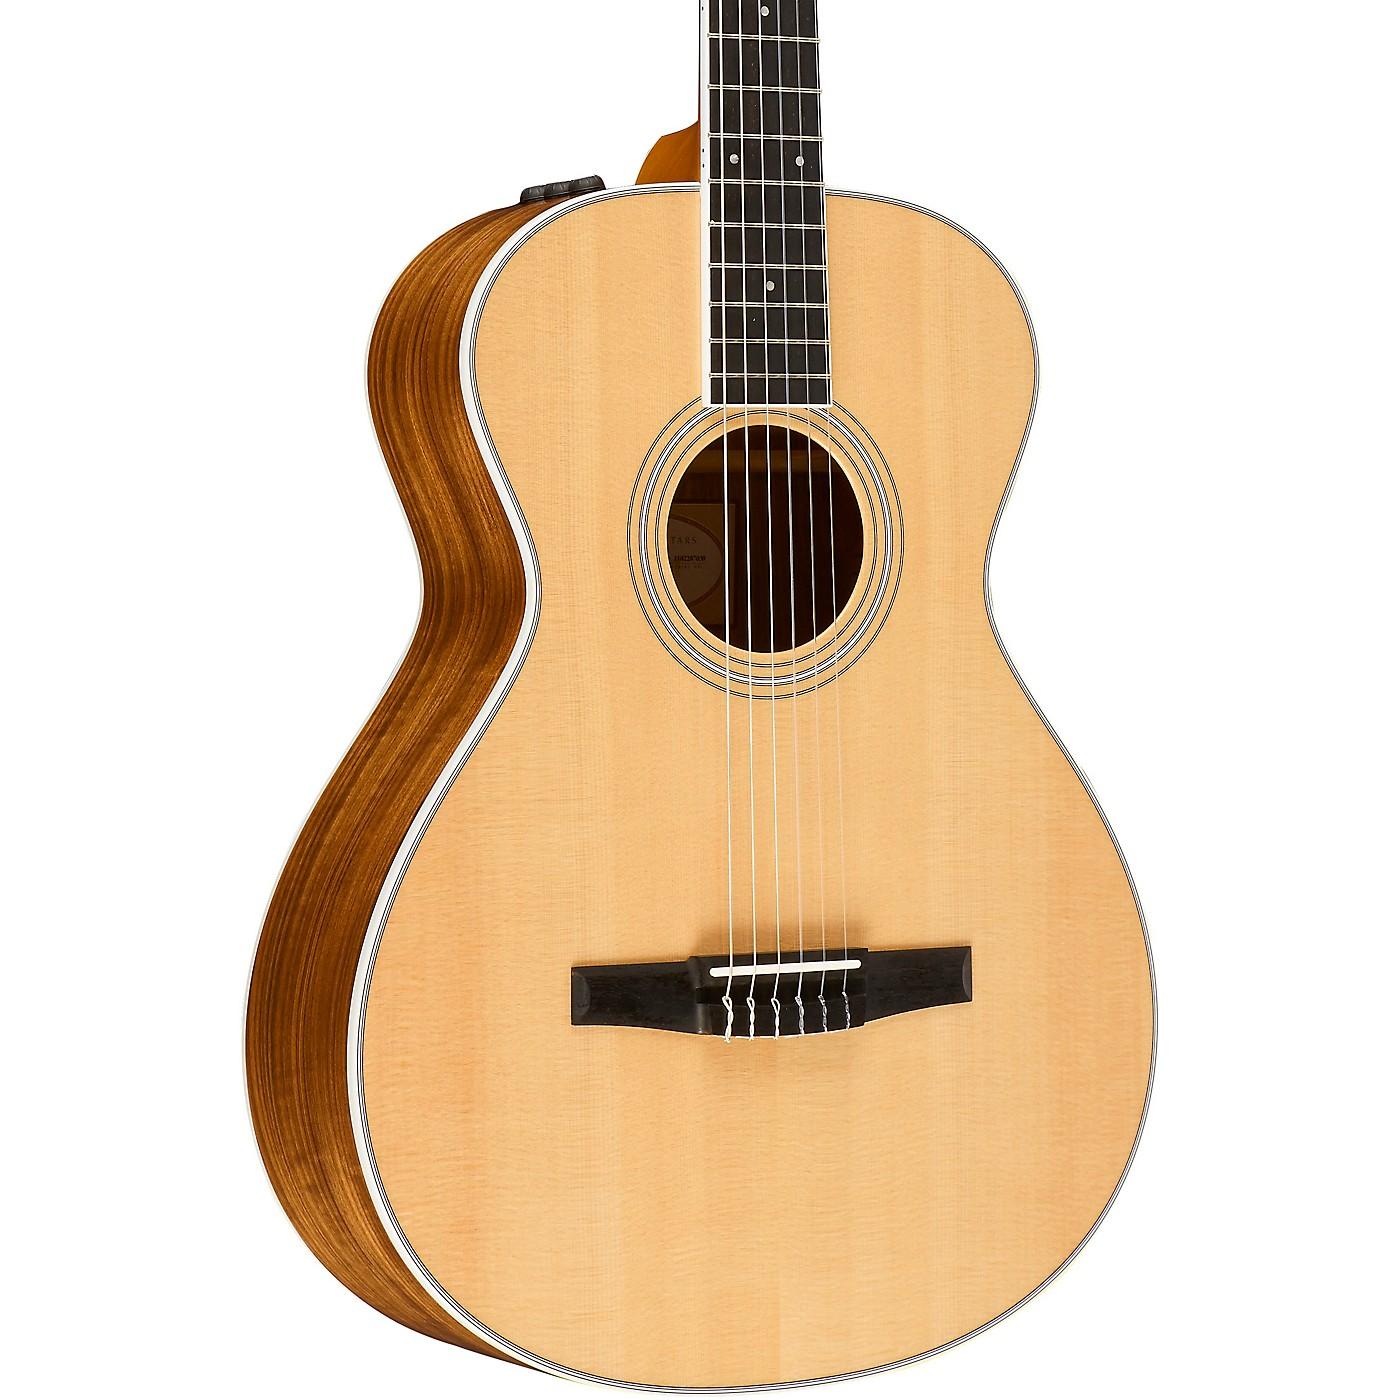 Taylor 412e-N Grand Concert Nylon String Acoustic-Electric Guitar thumbnail